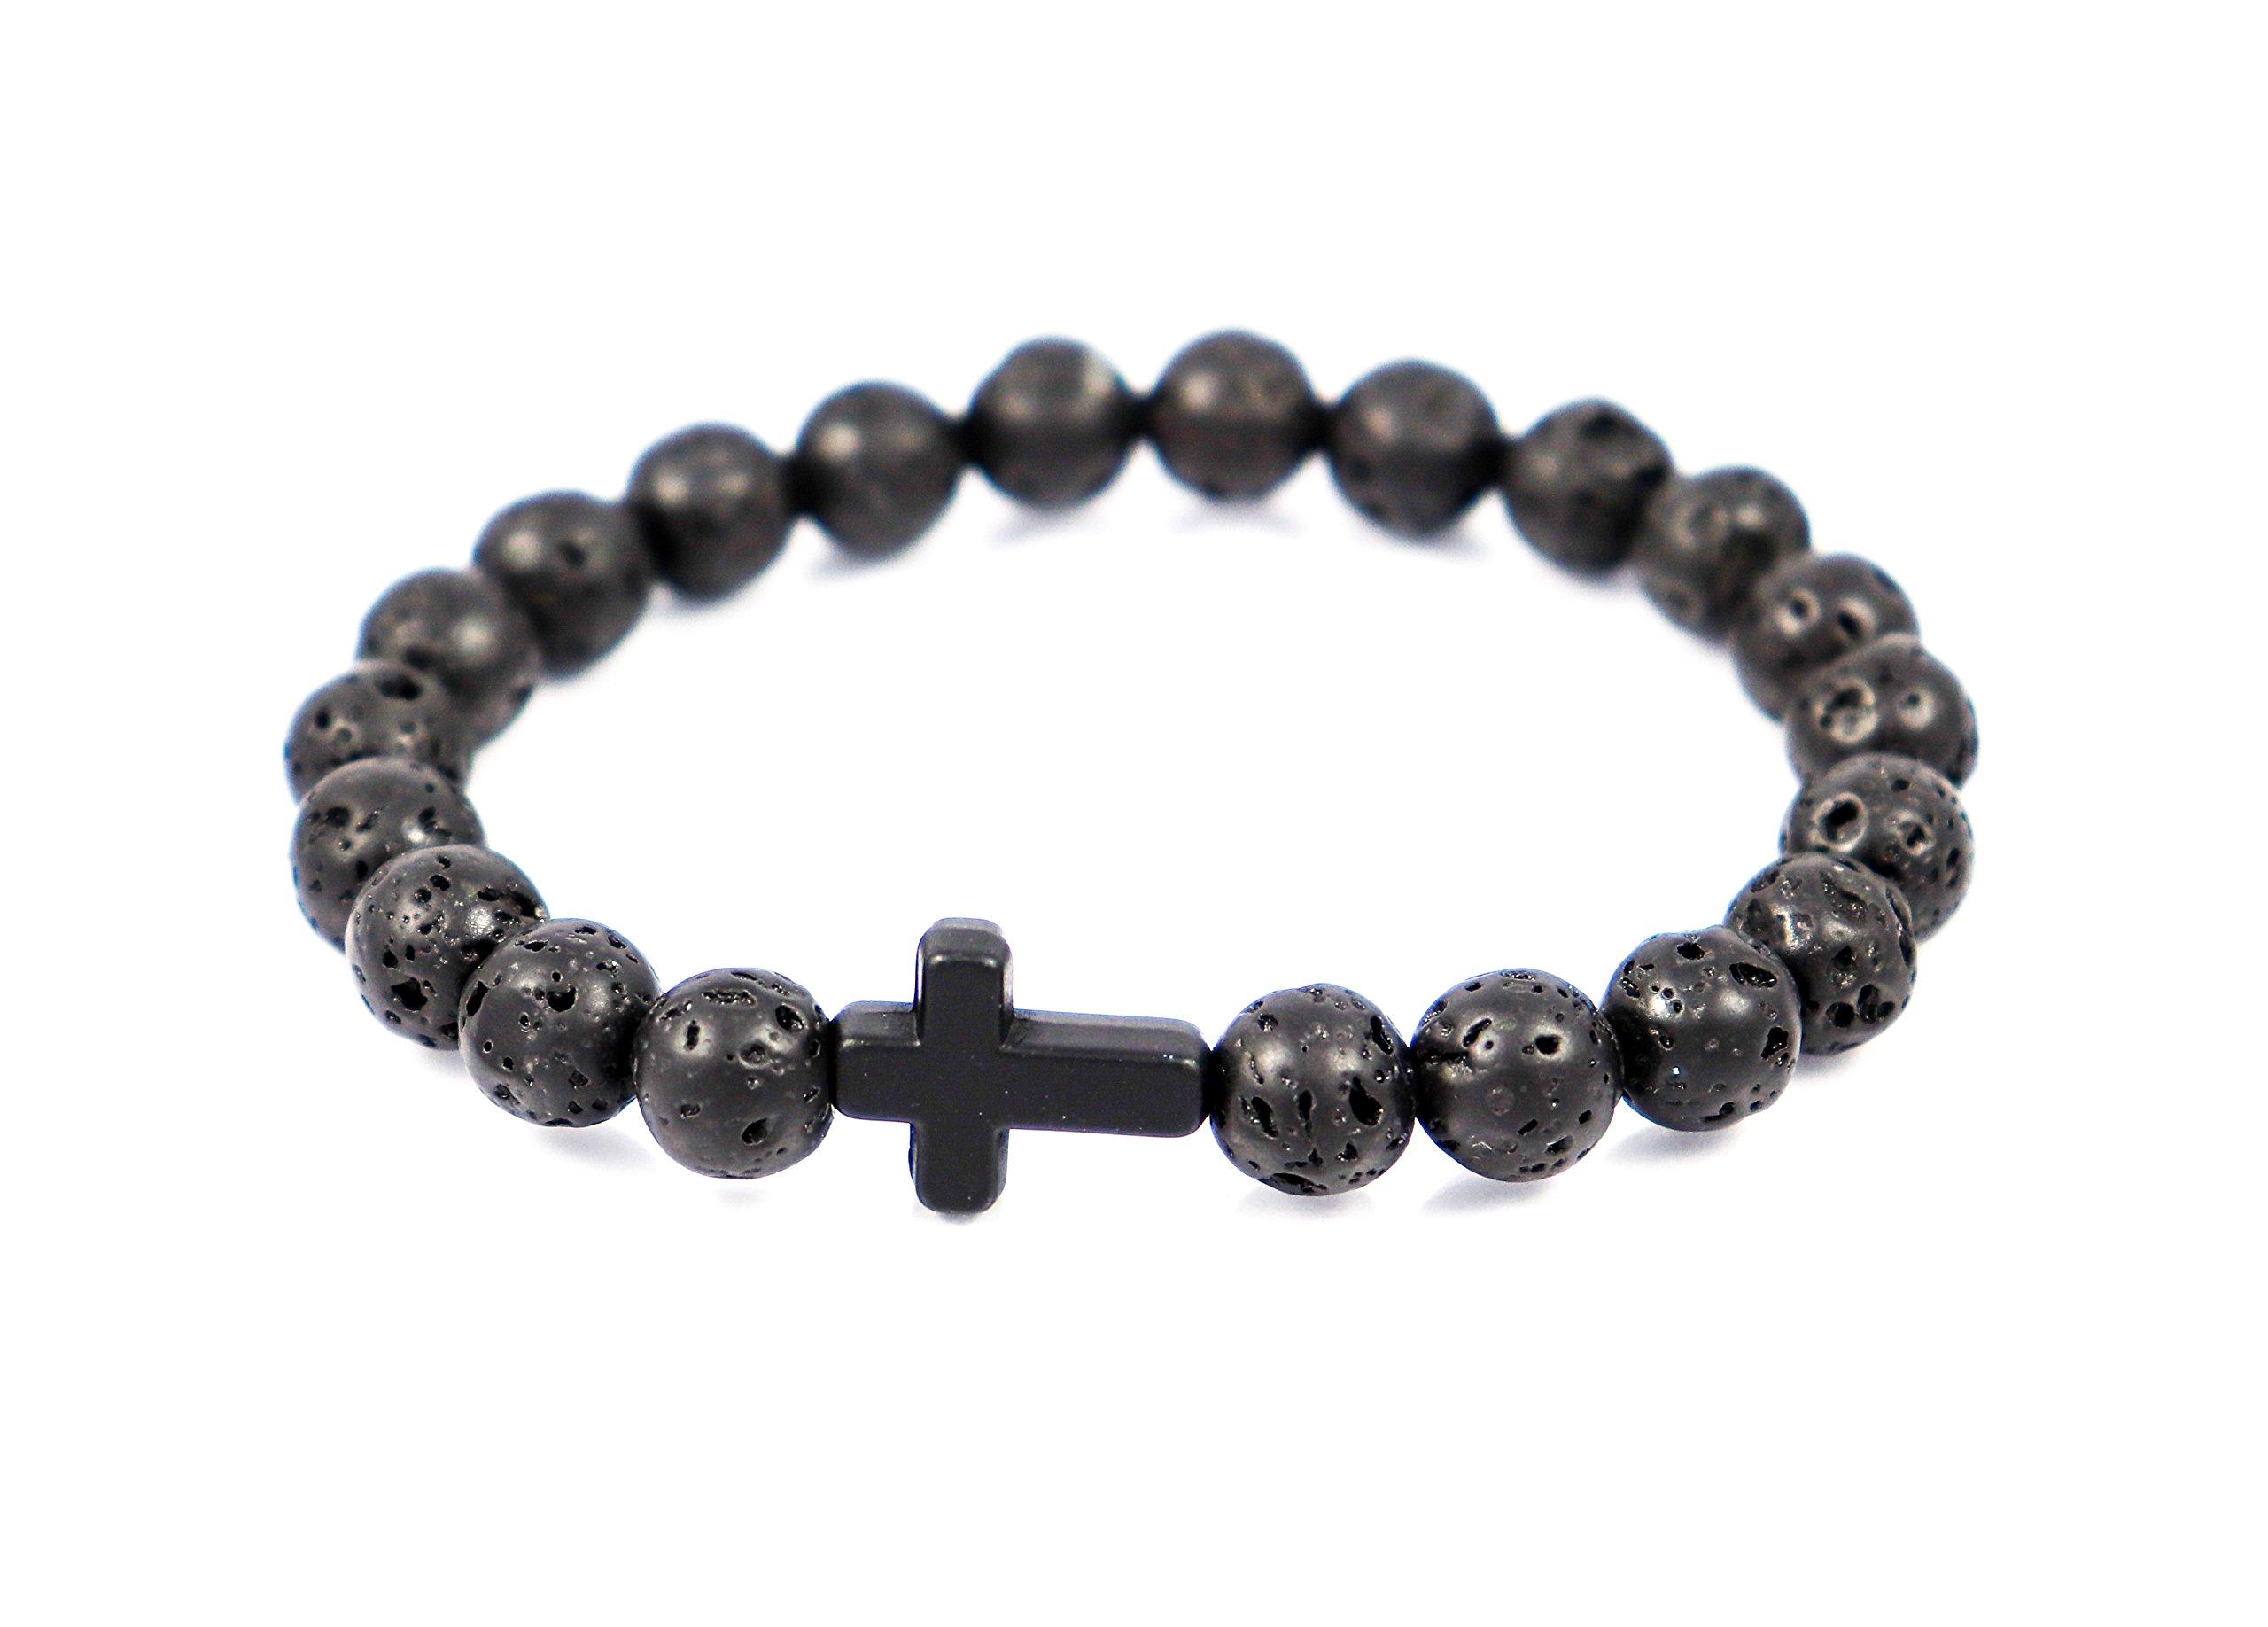 Hapi Life Mens Womens Religious Cross & 8mm Lava Rock Essential Oil Diffuser Energy Healing Elastic Bracelet Jewelry Bag